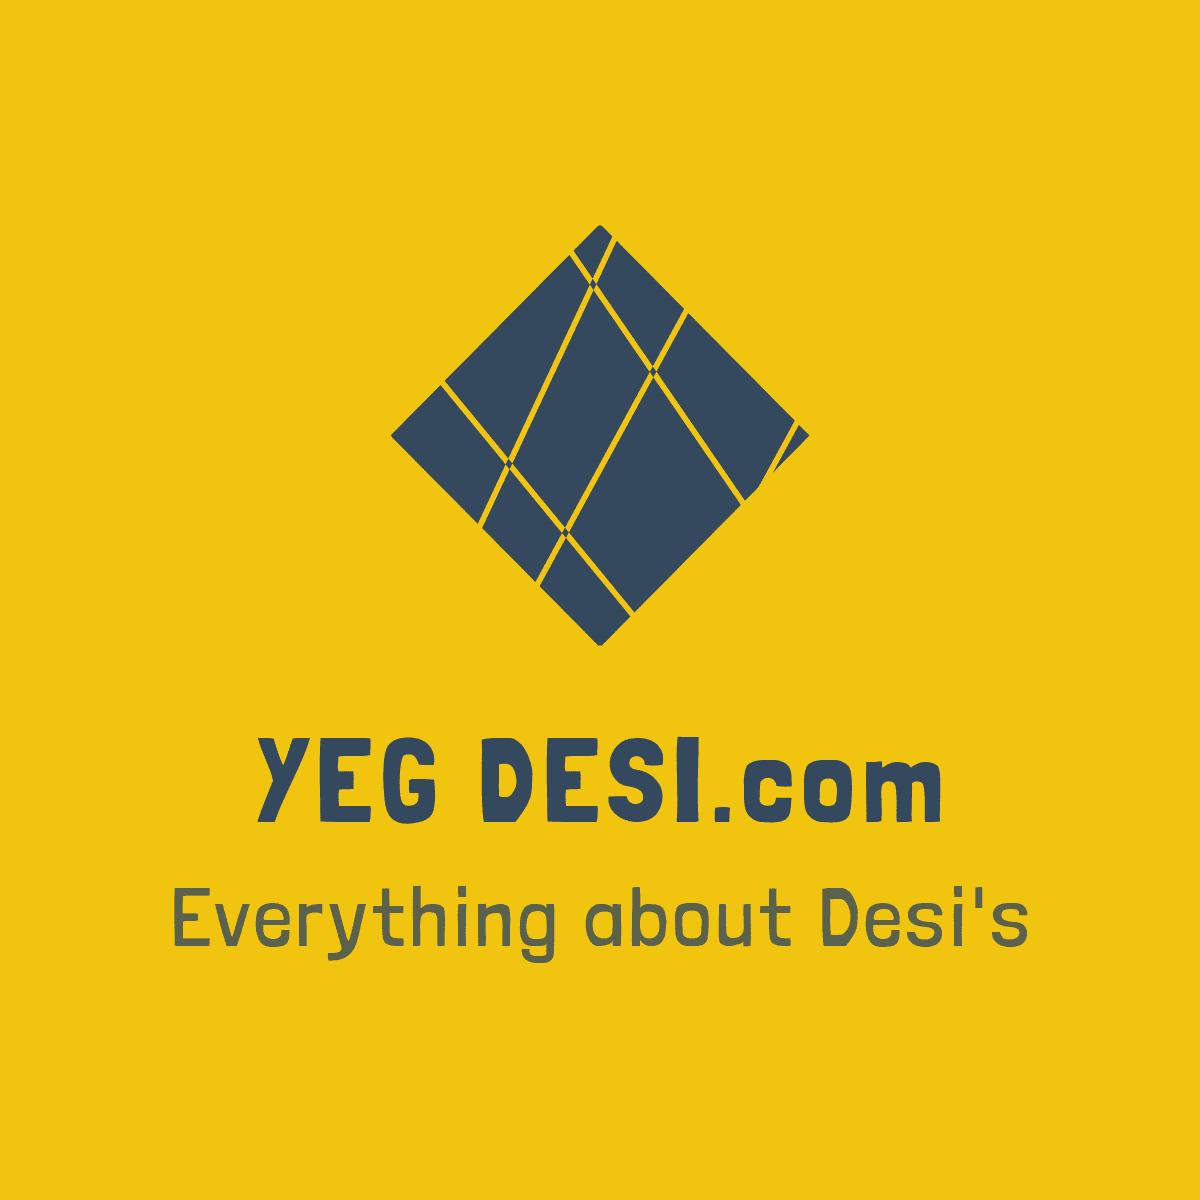 yegdesi.com